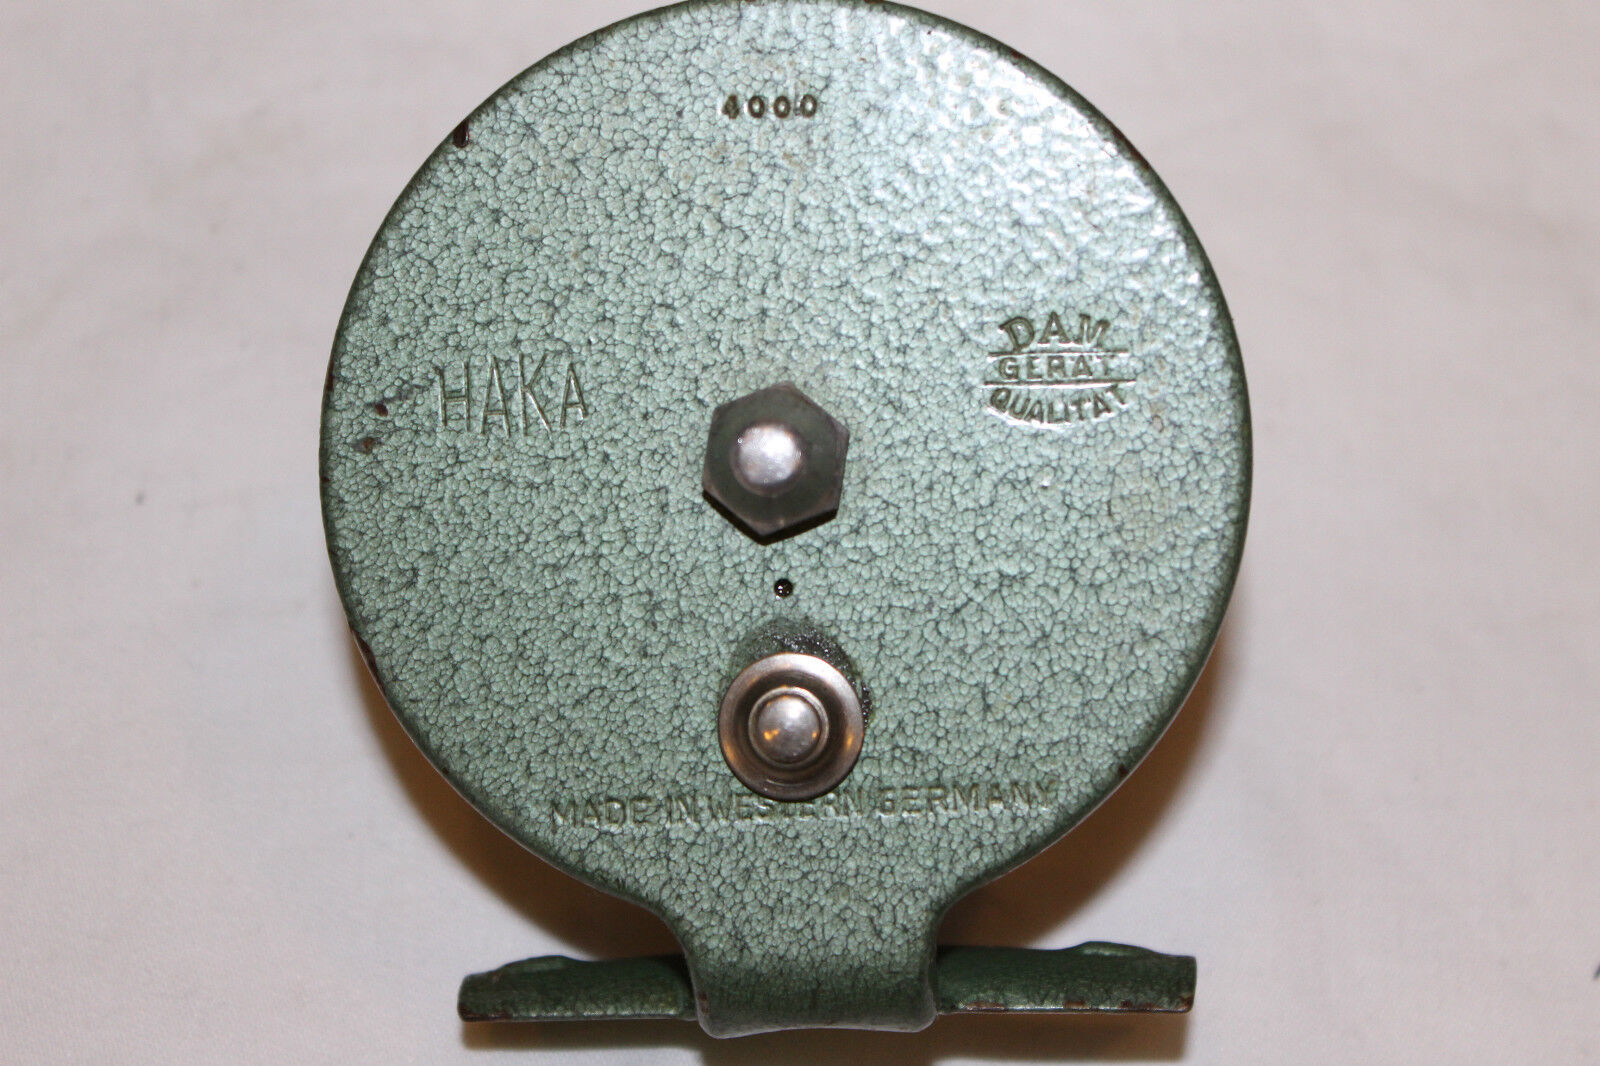 DAM  HAKA 4000- MADE IN WESTERN GERMANY- Nr.1